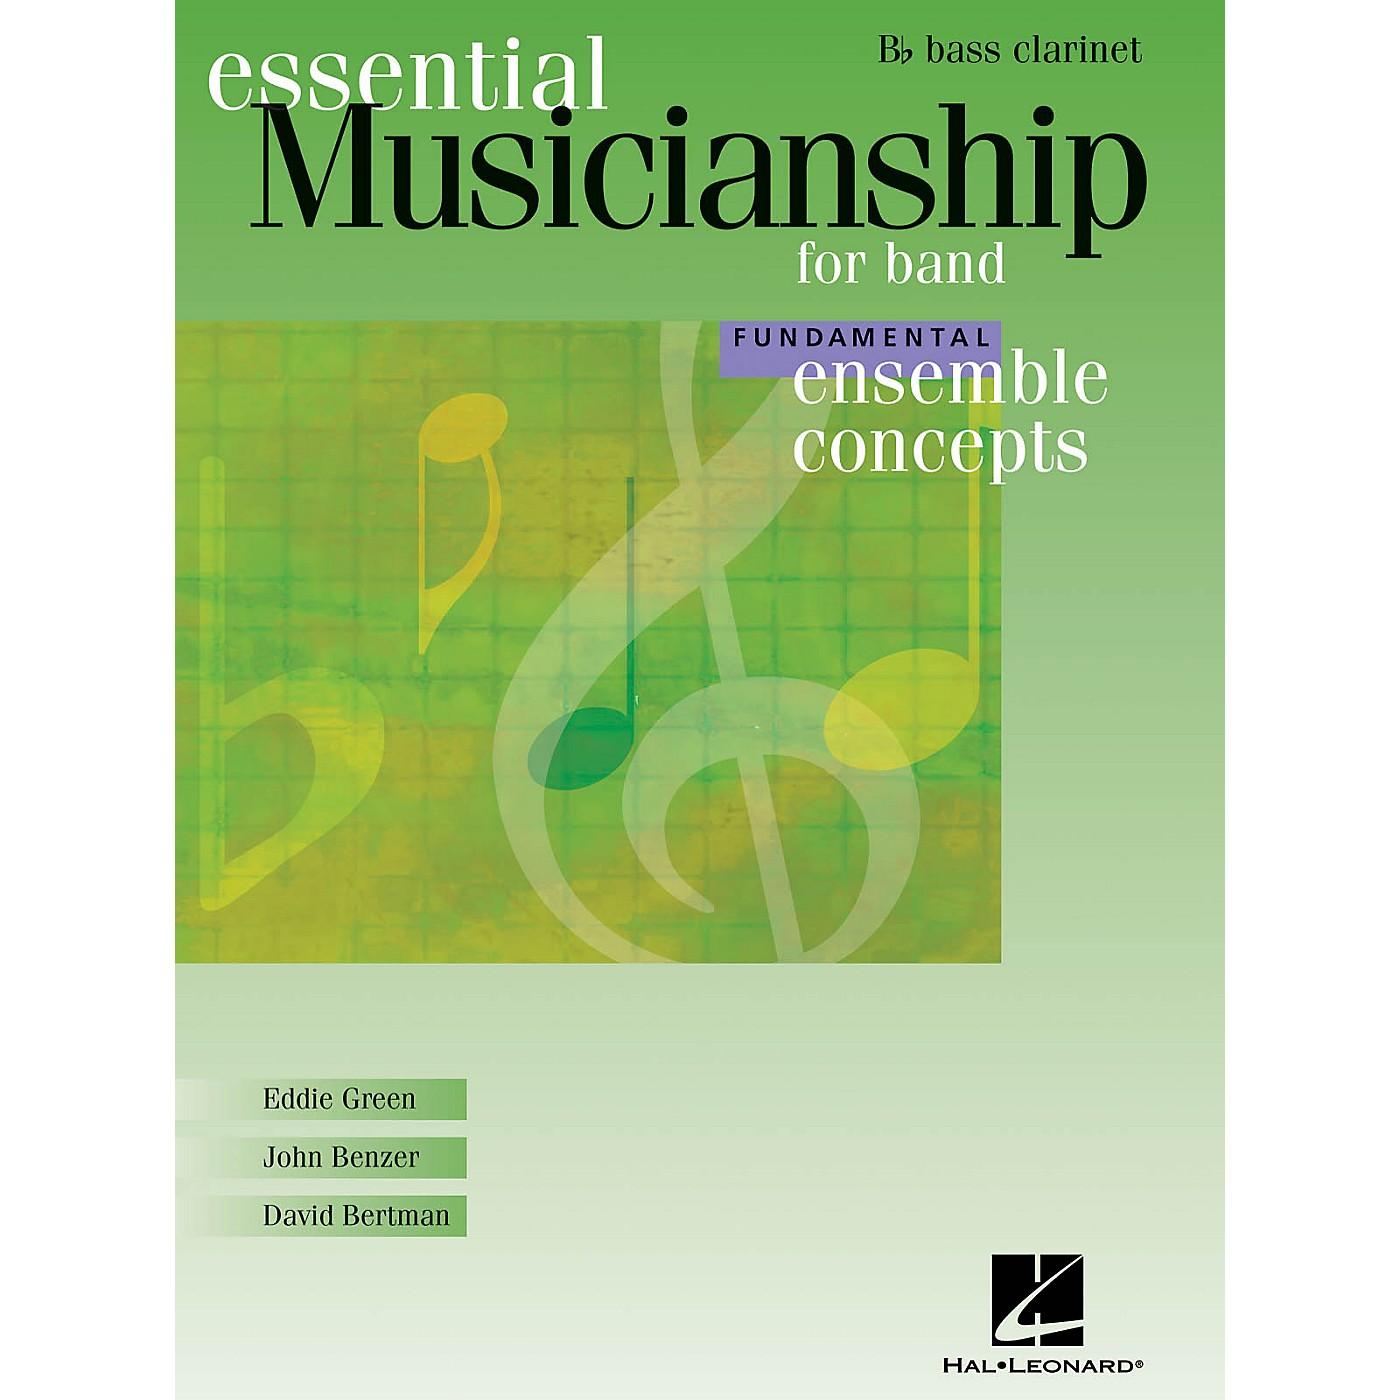 Hal Leonard Essential Musicianship for Band - Ensemble Concepts (Fundamental Level - Bb Bass Clarinet) Concert Band thumbnail